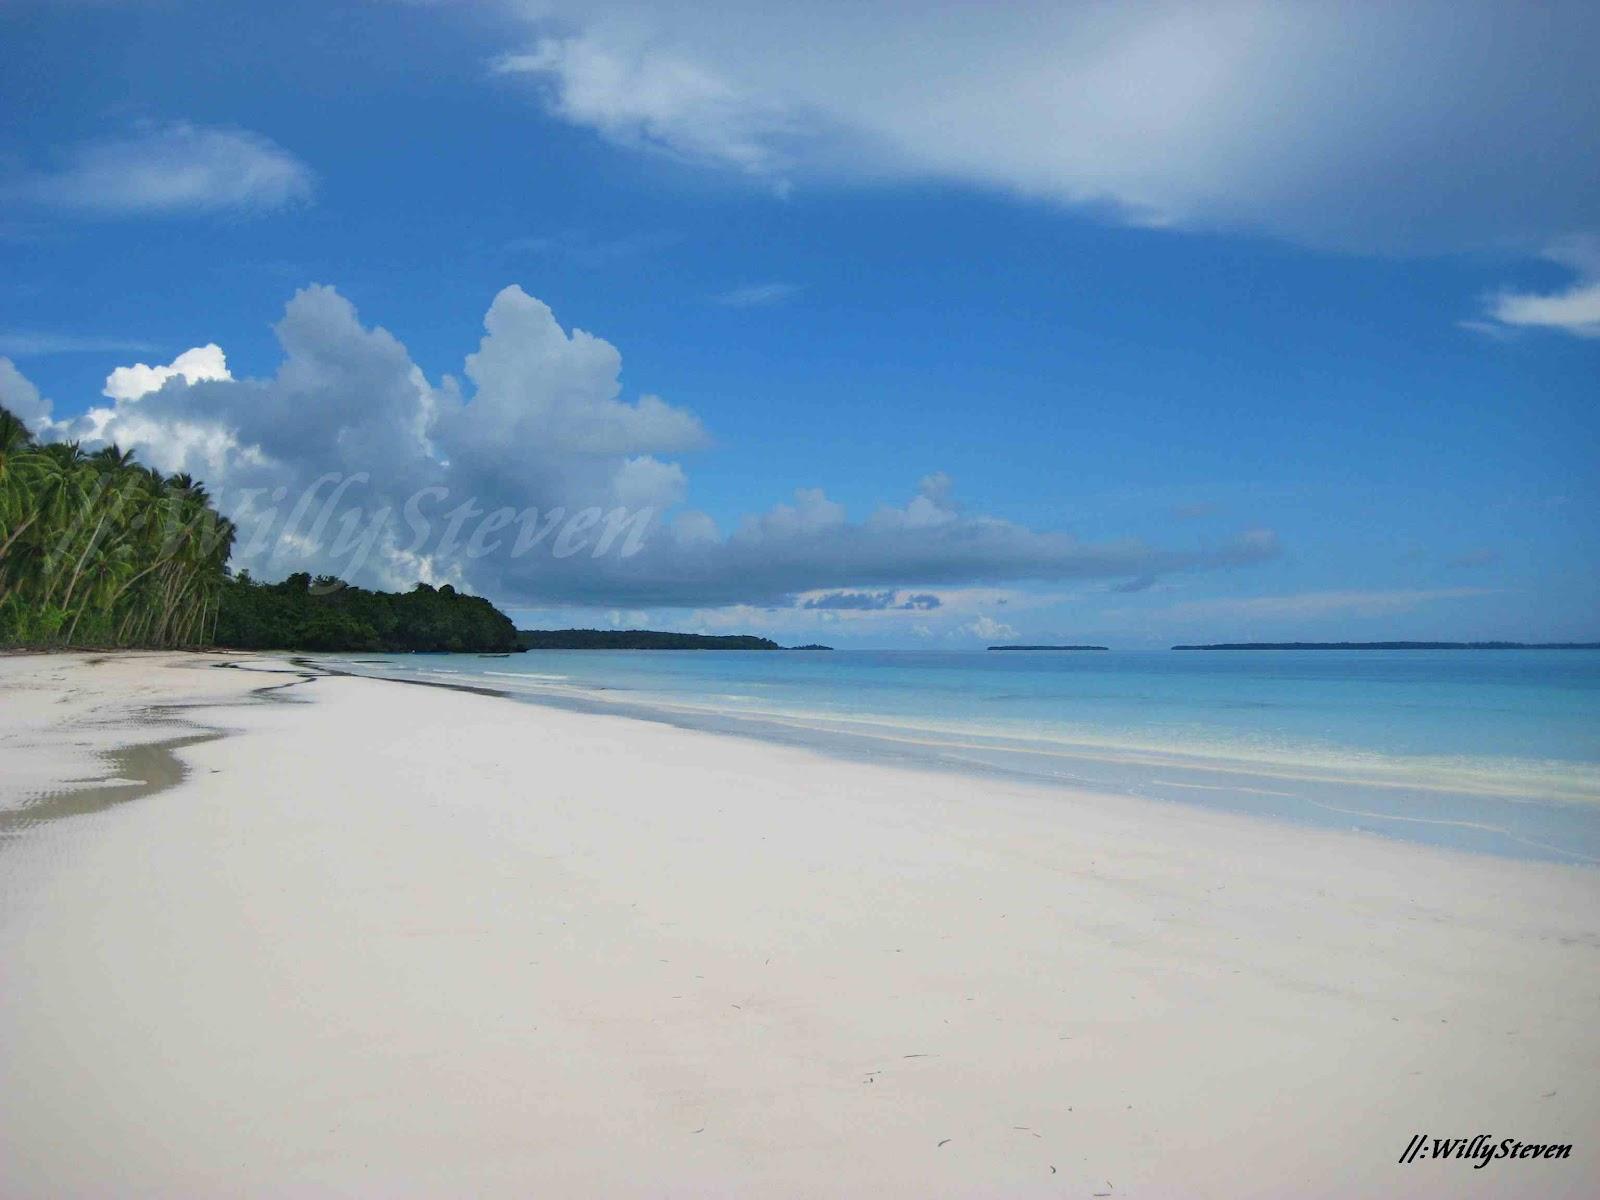 Travellermeds Beauty Beach Maluku Tenggara Pantai Pasir Panjang Ngur Bloat